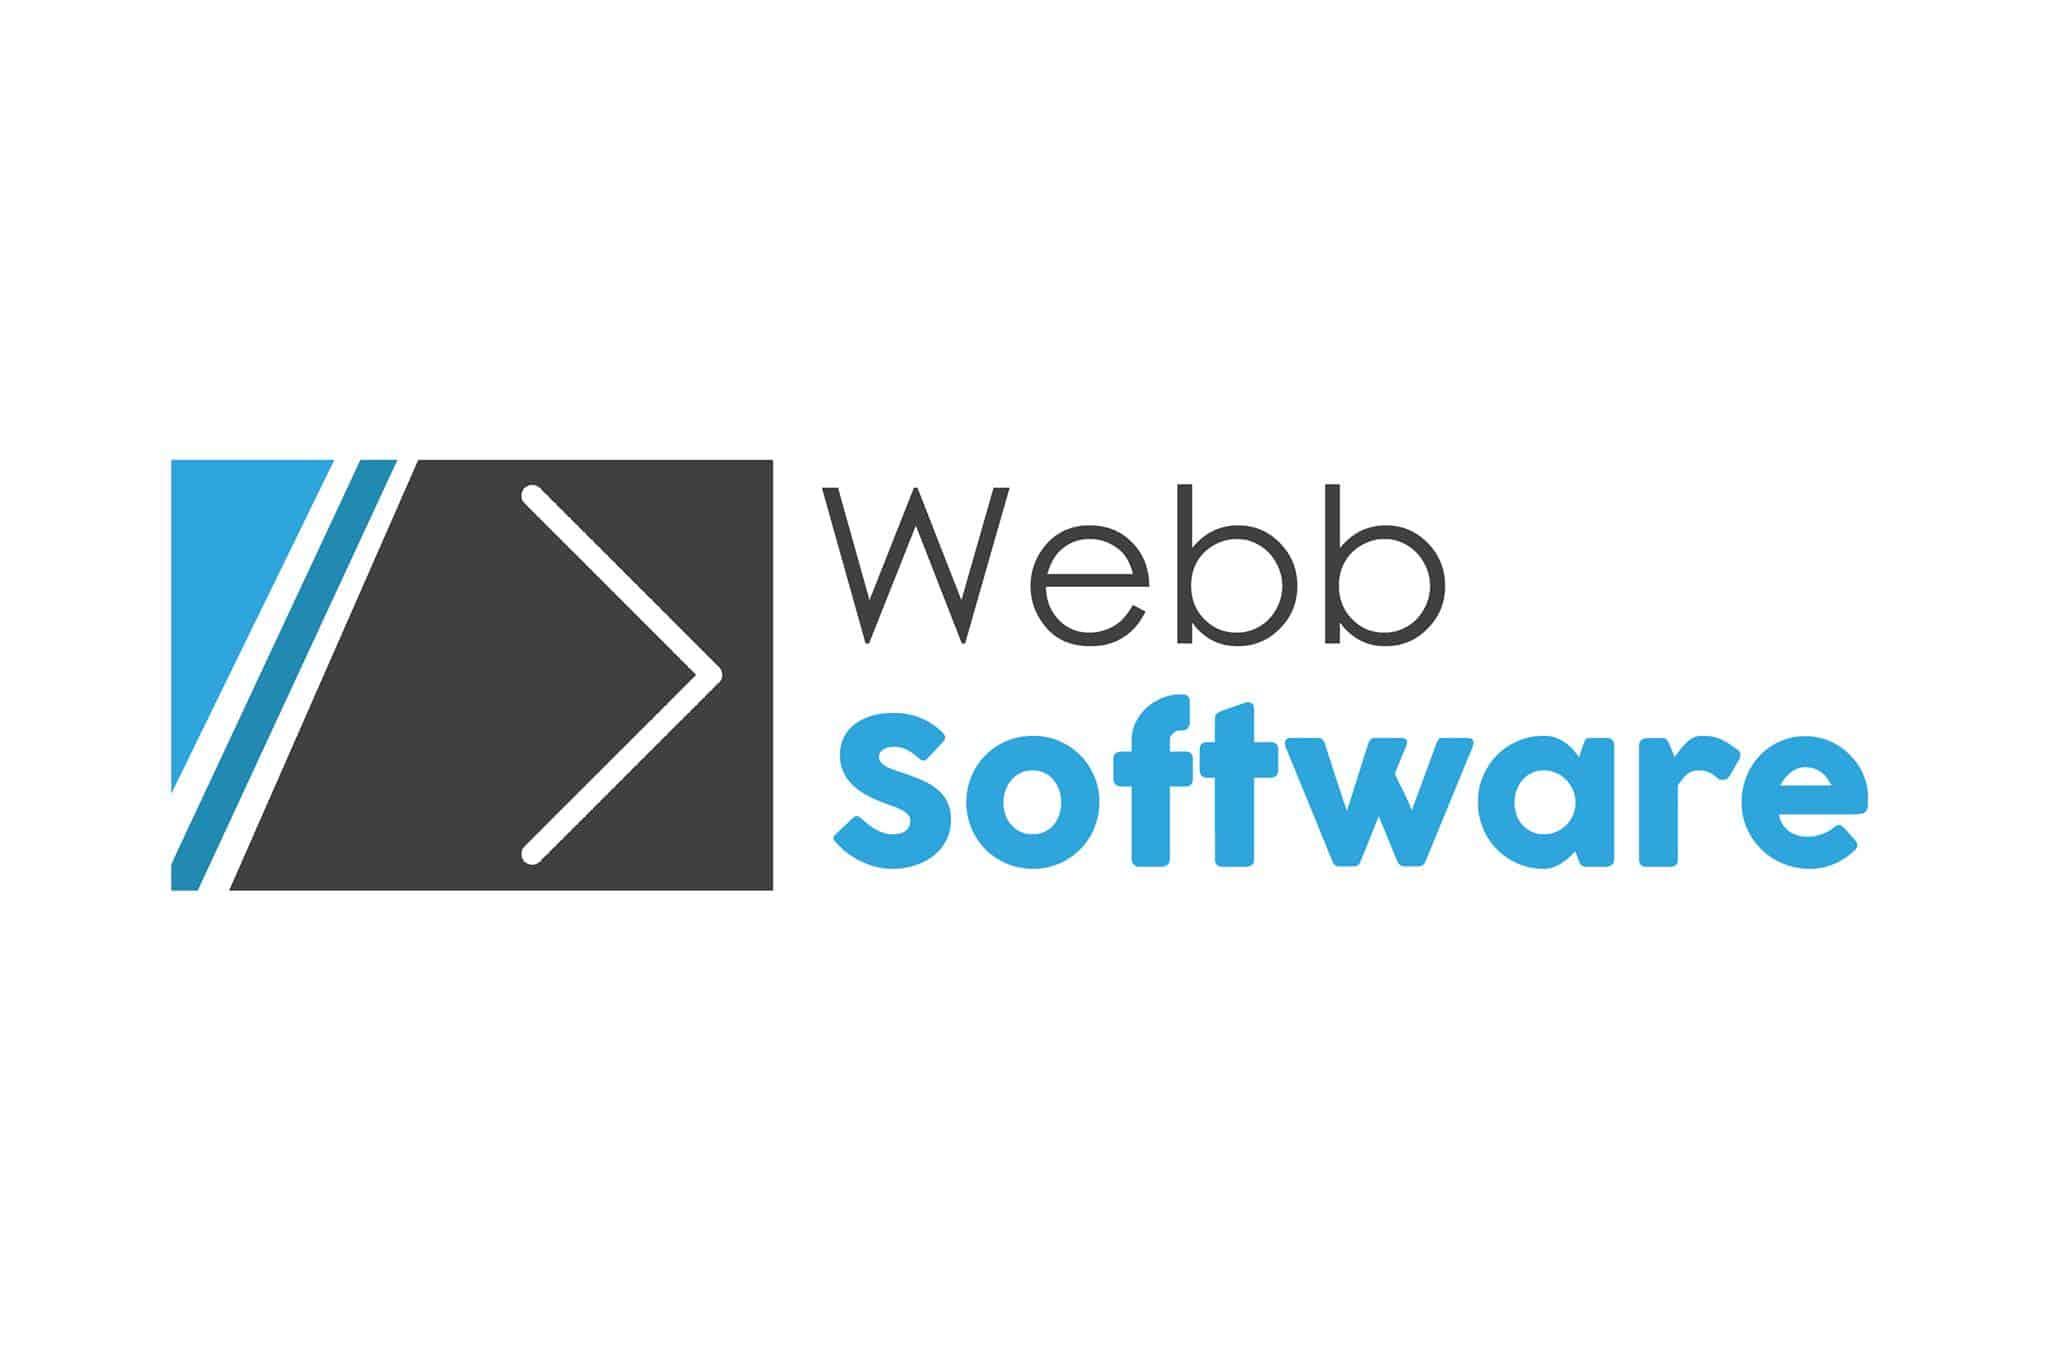 Webb Software